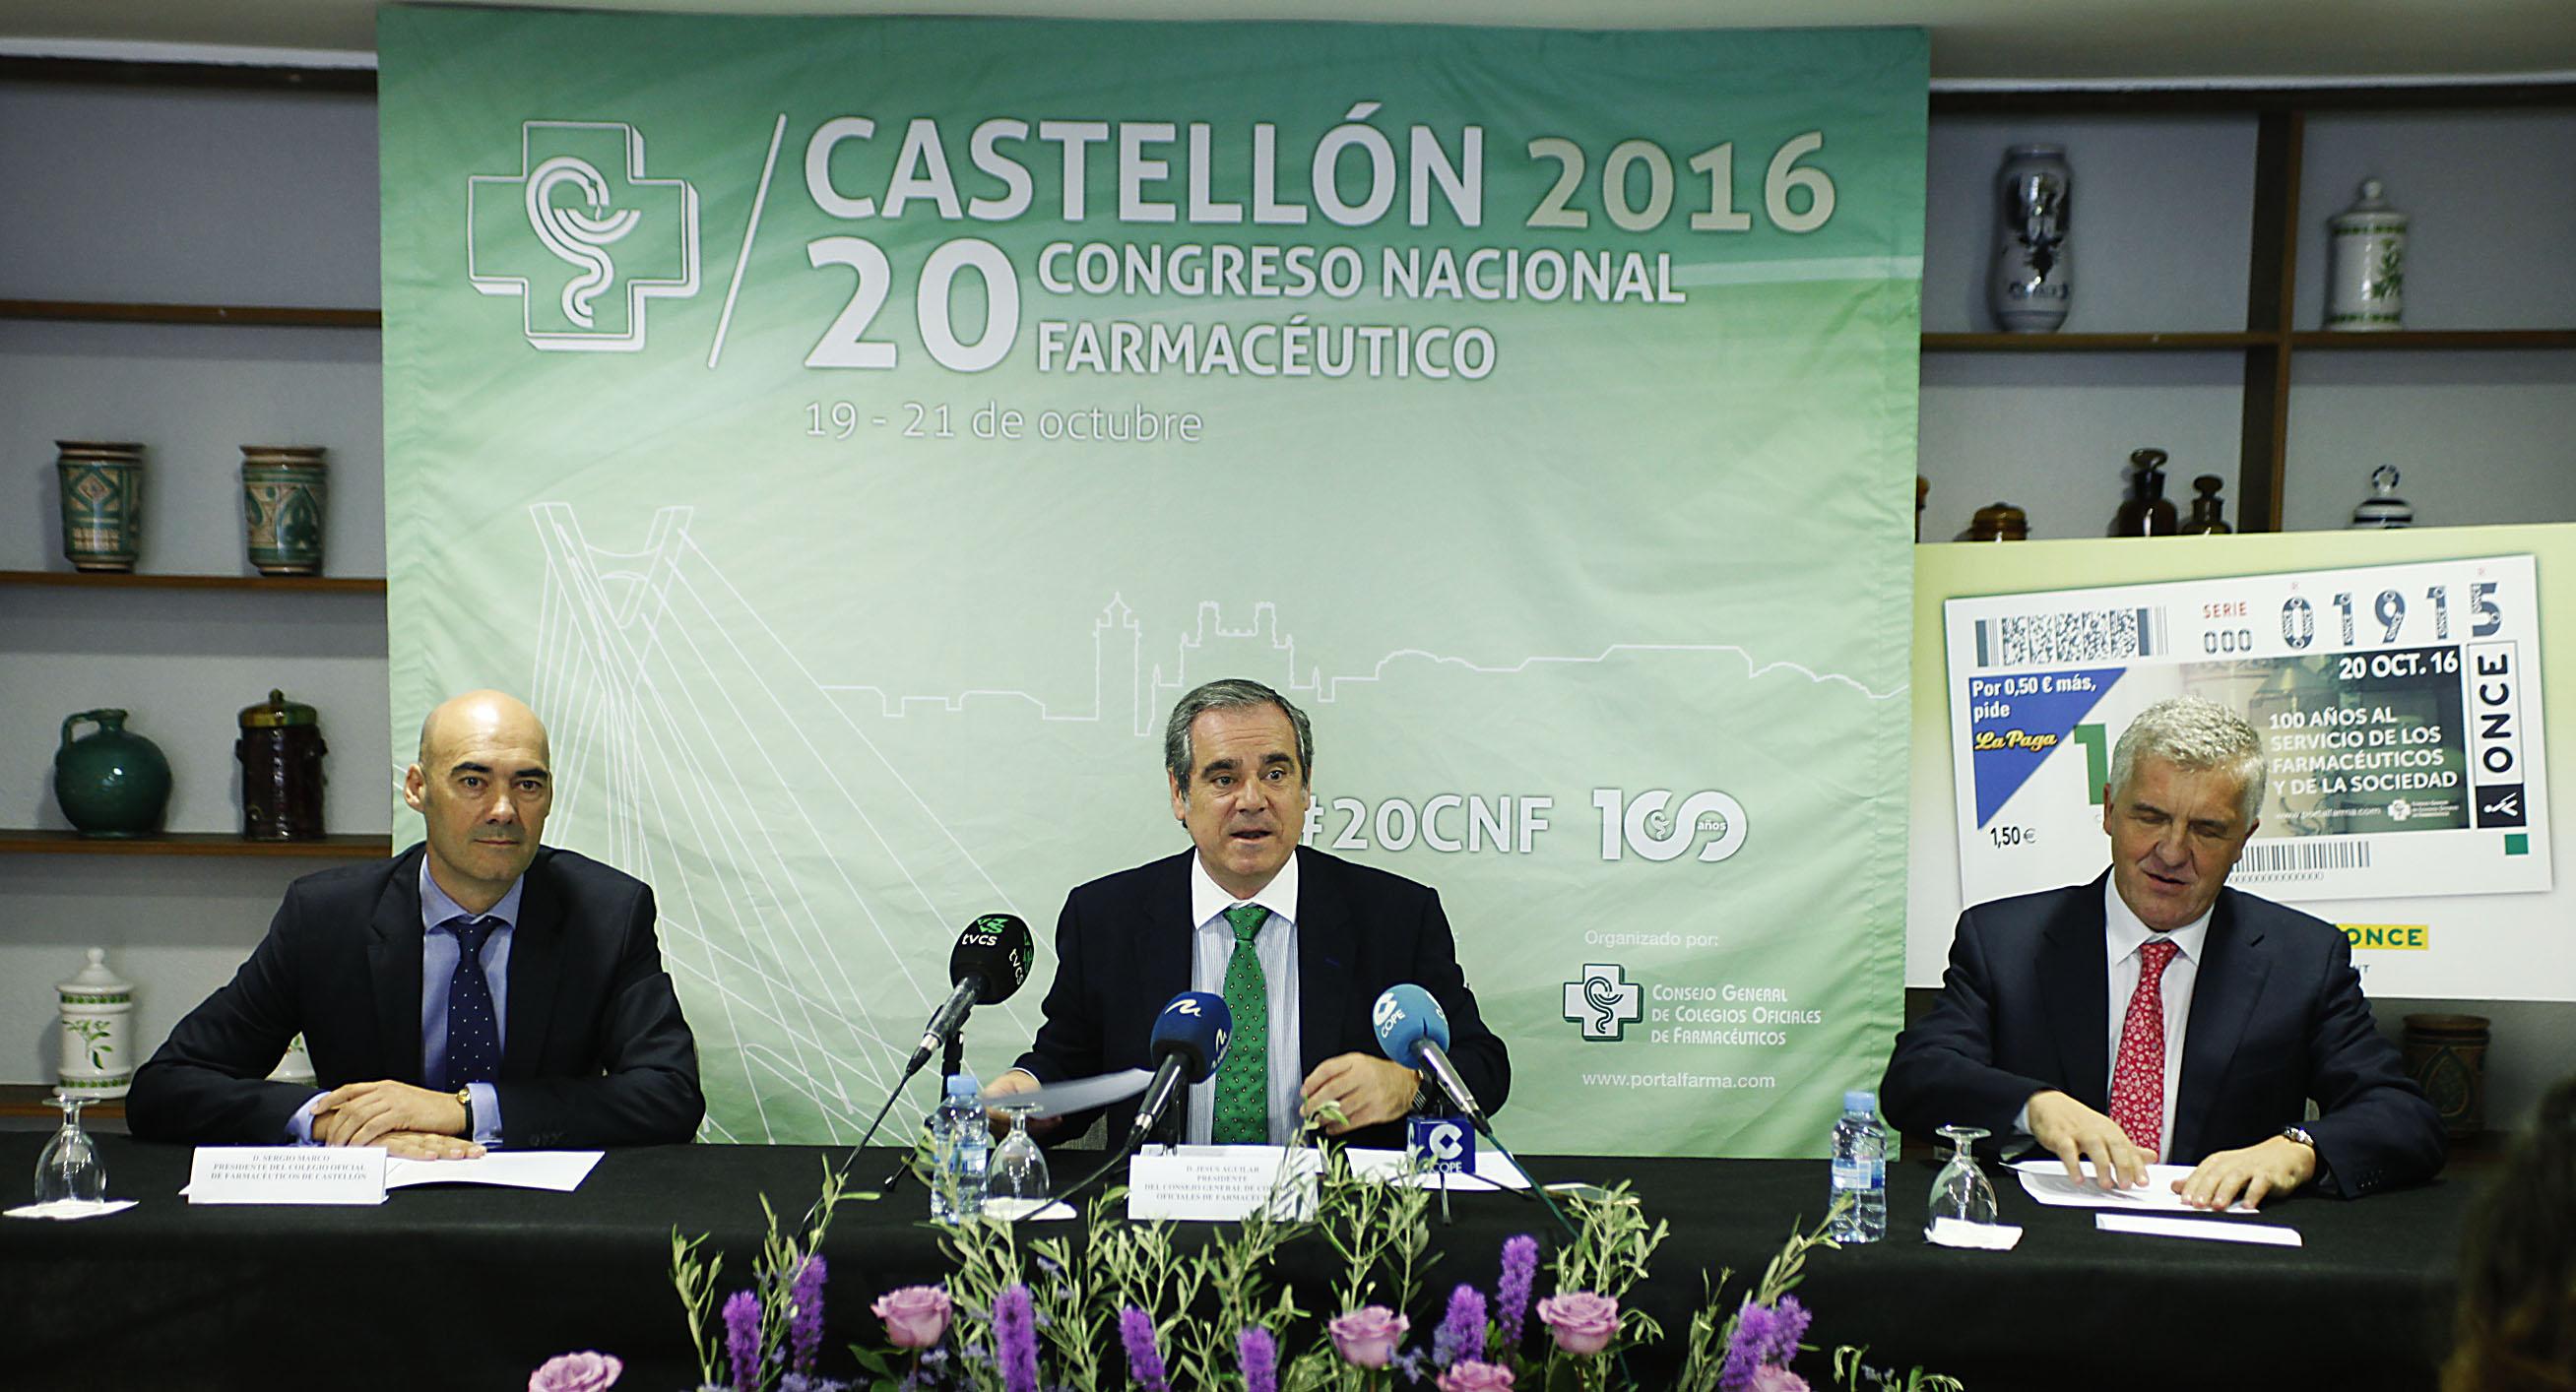 Castellón 2016